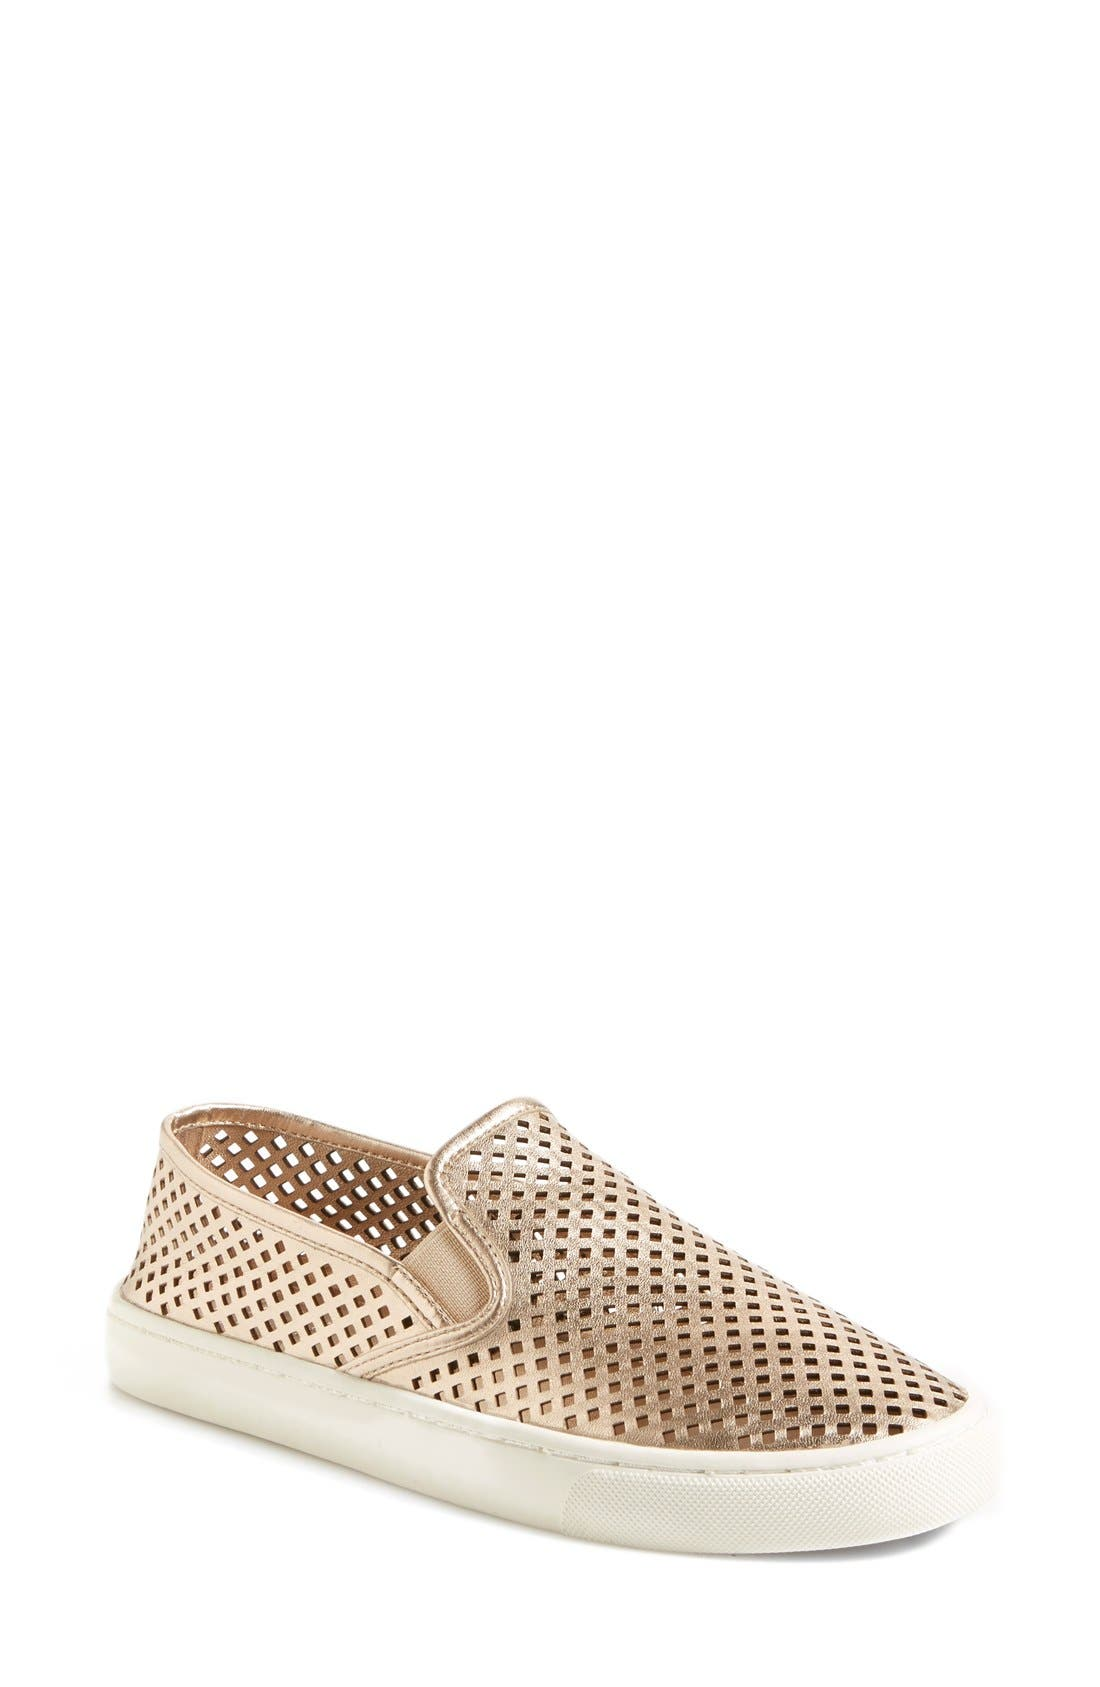 Main Image - Tory Burch 'Jesse' Perforated Sneaker (Women)